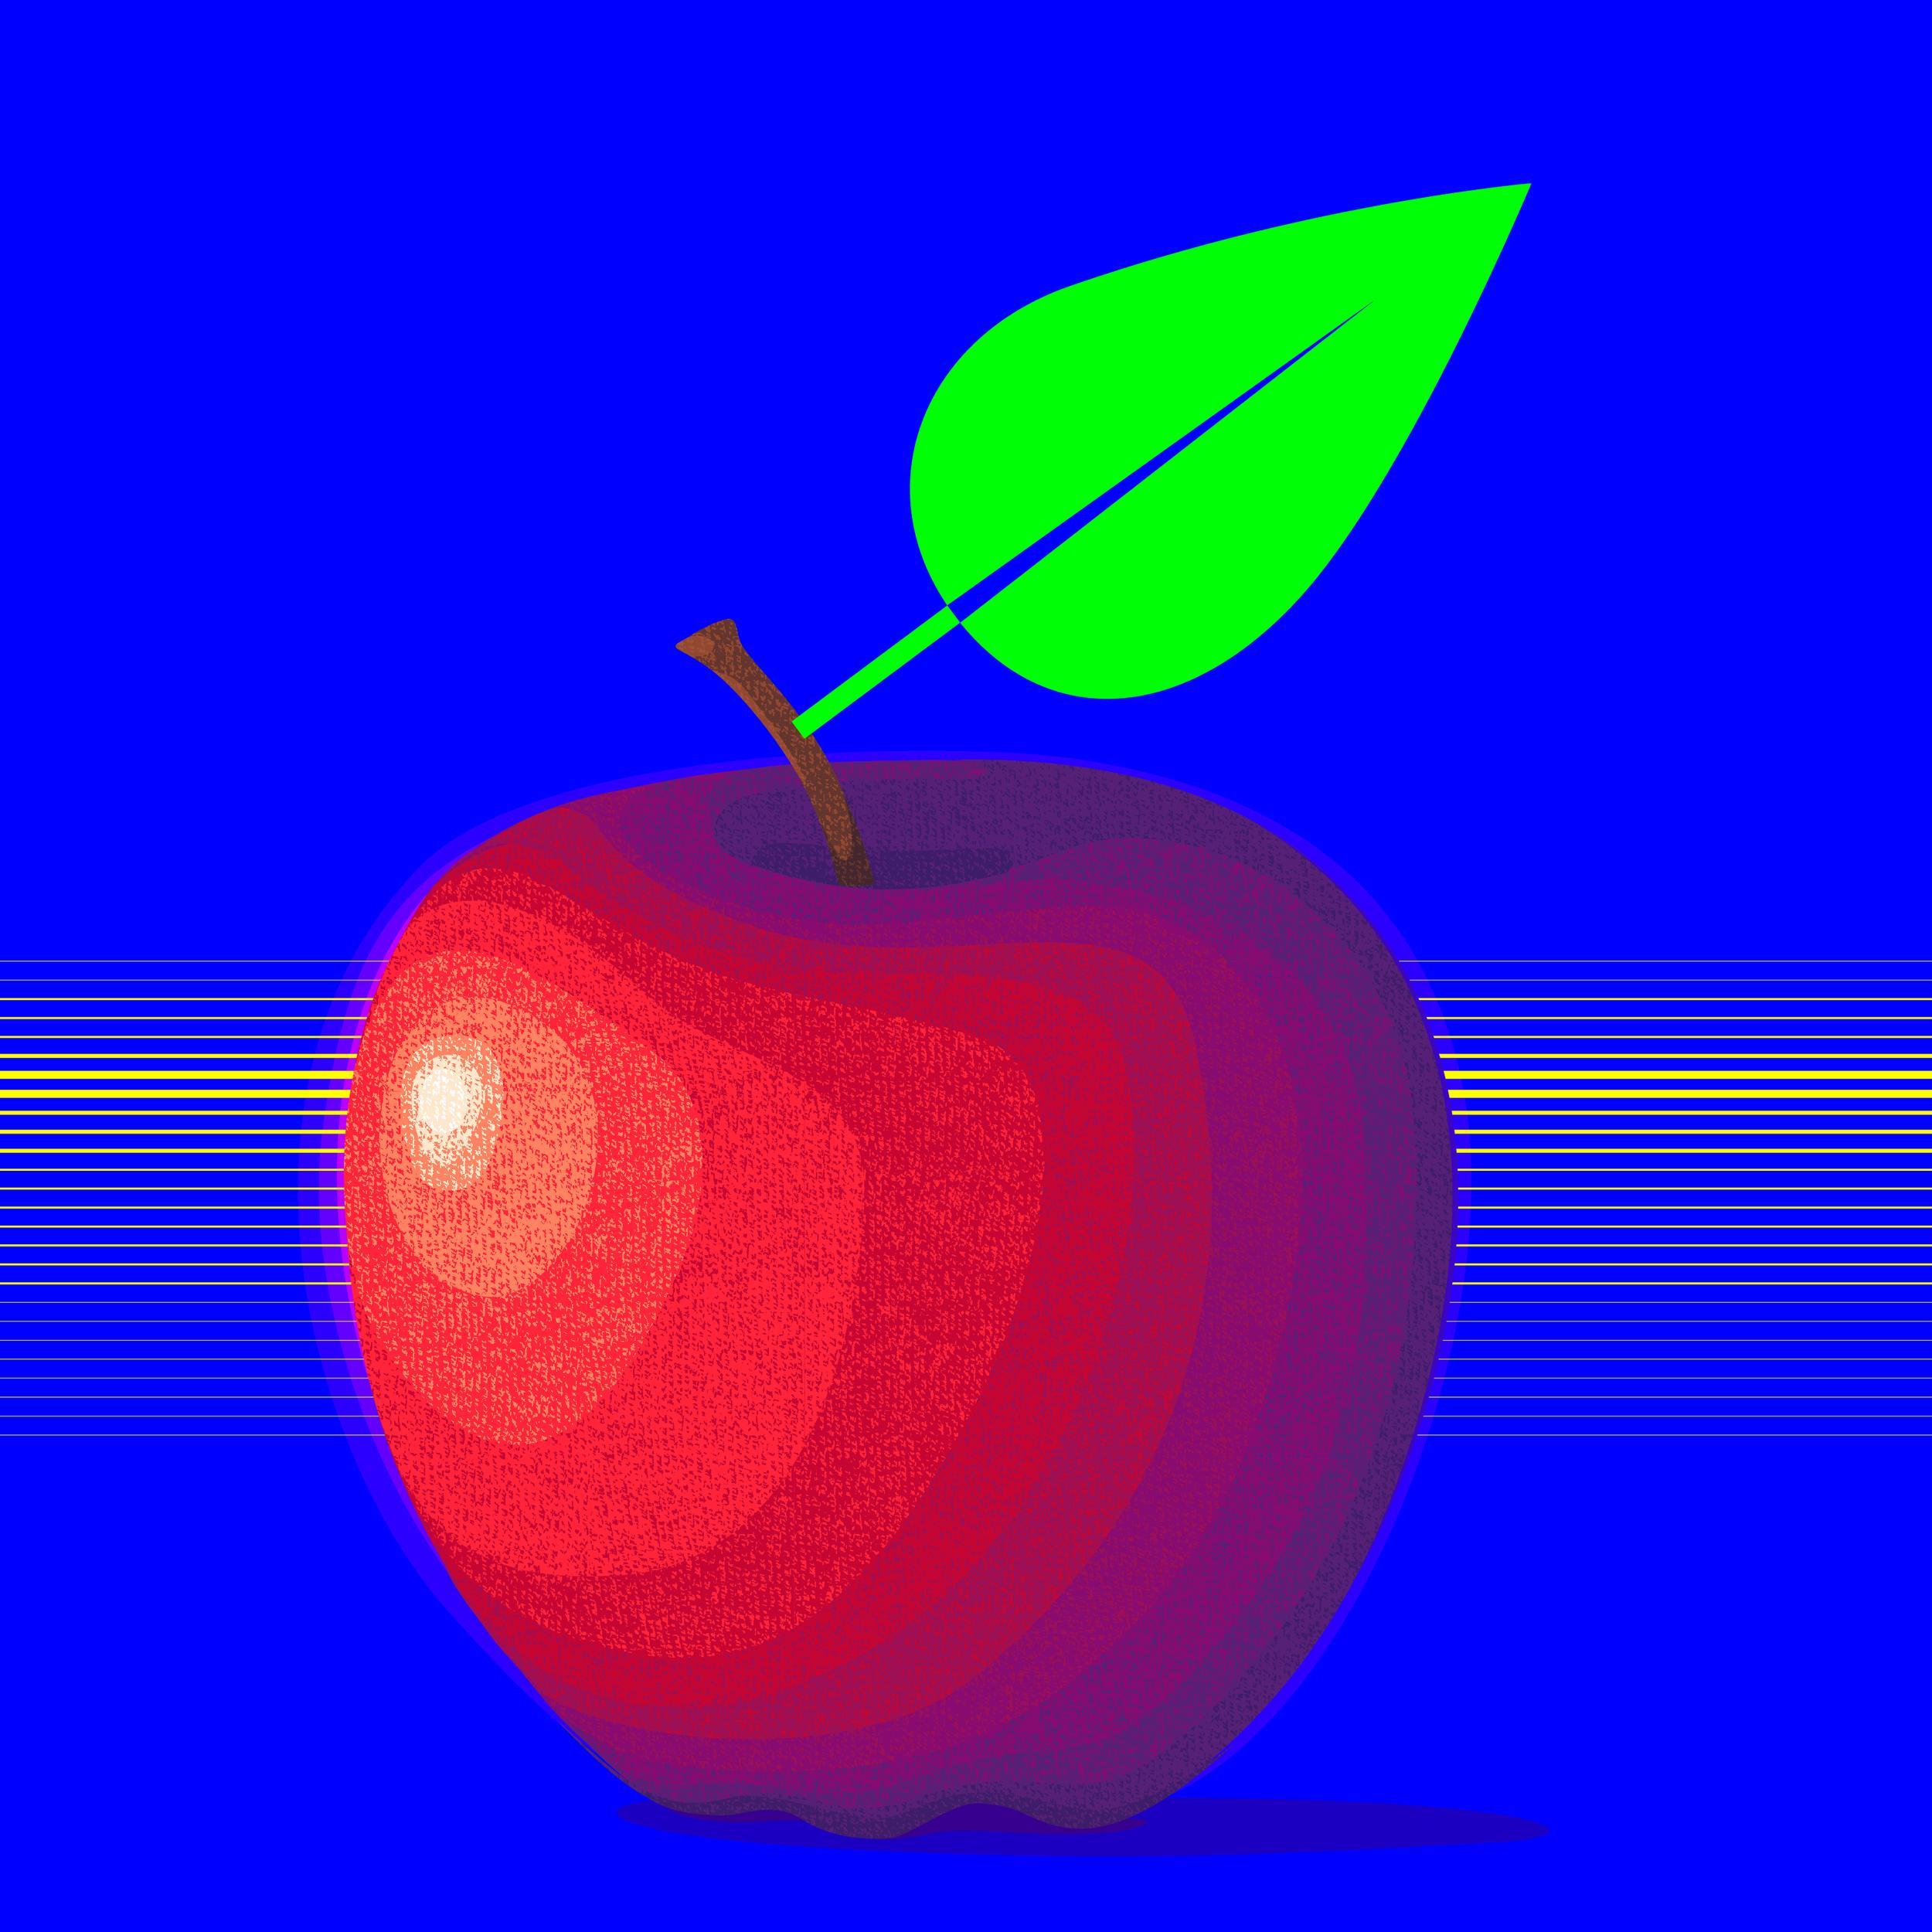 apple-fruit-01.png